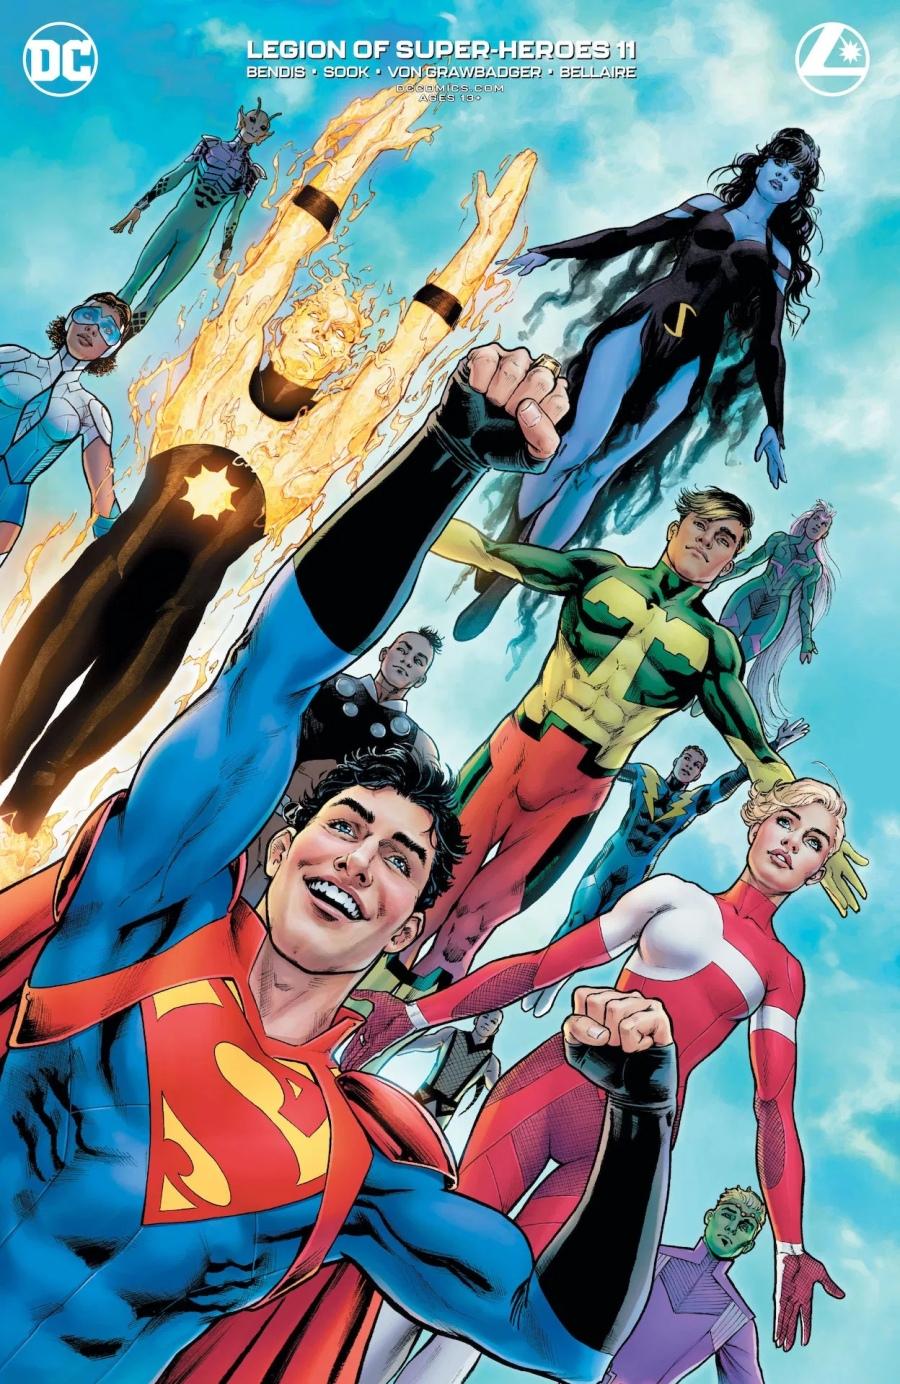 Legion of Superheroes #11 Review | The Aspiring Kryptonian